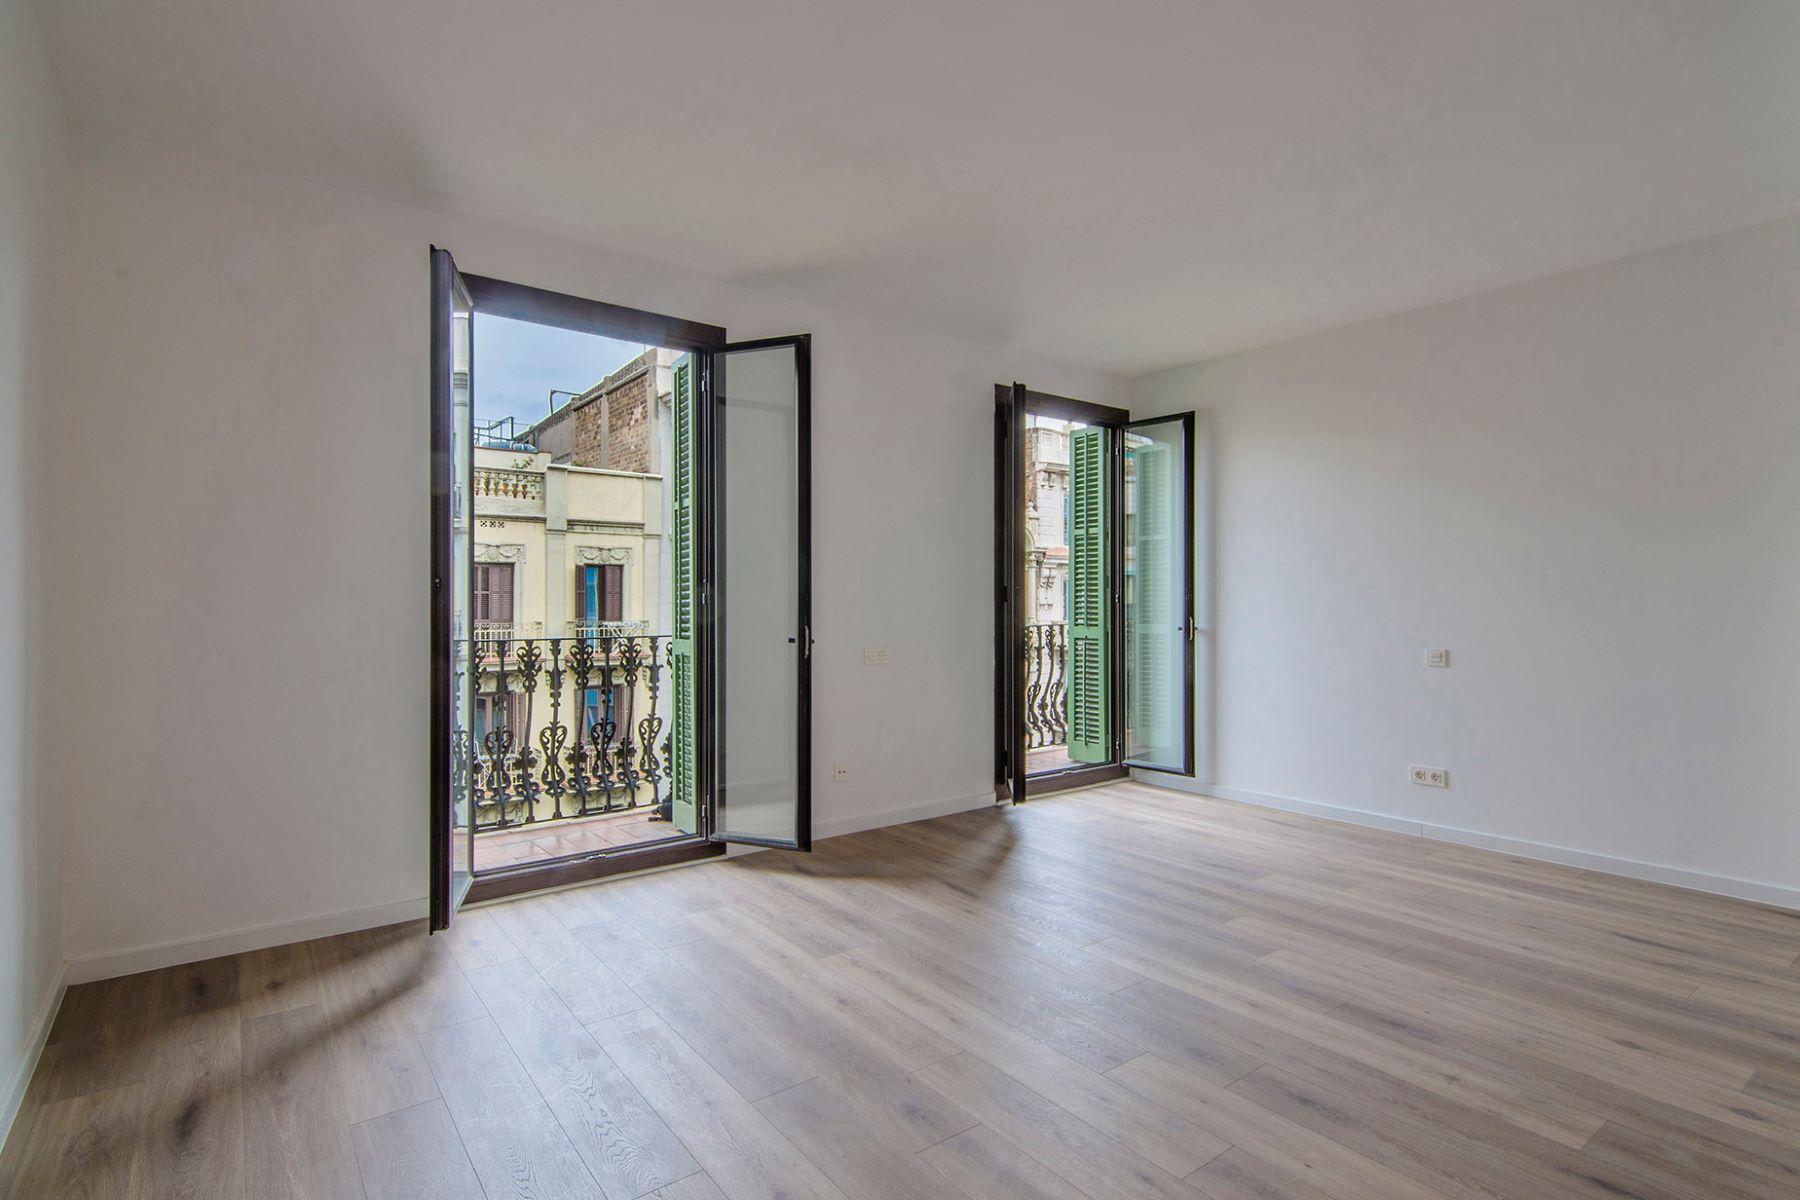 Căn hộ vì Bán tại Apartment to move to in teh Left Side of Eixample Barcelona City, Barcelona, 08007 Tây Ban Nha